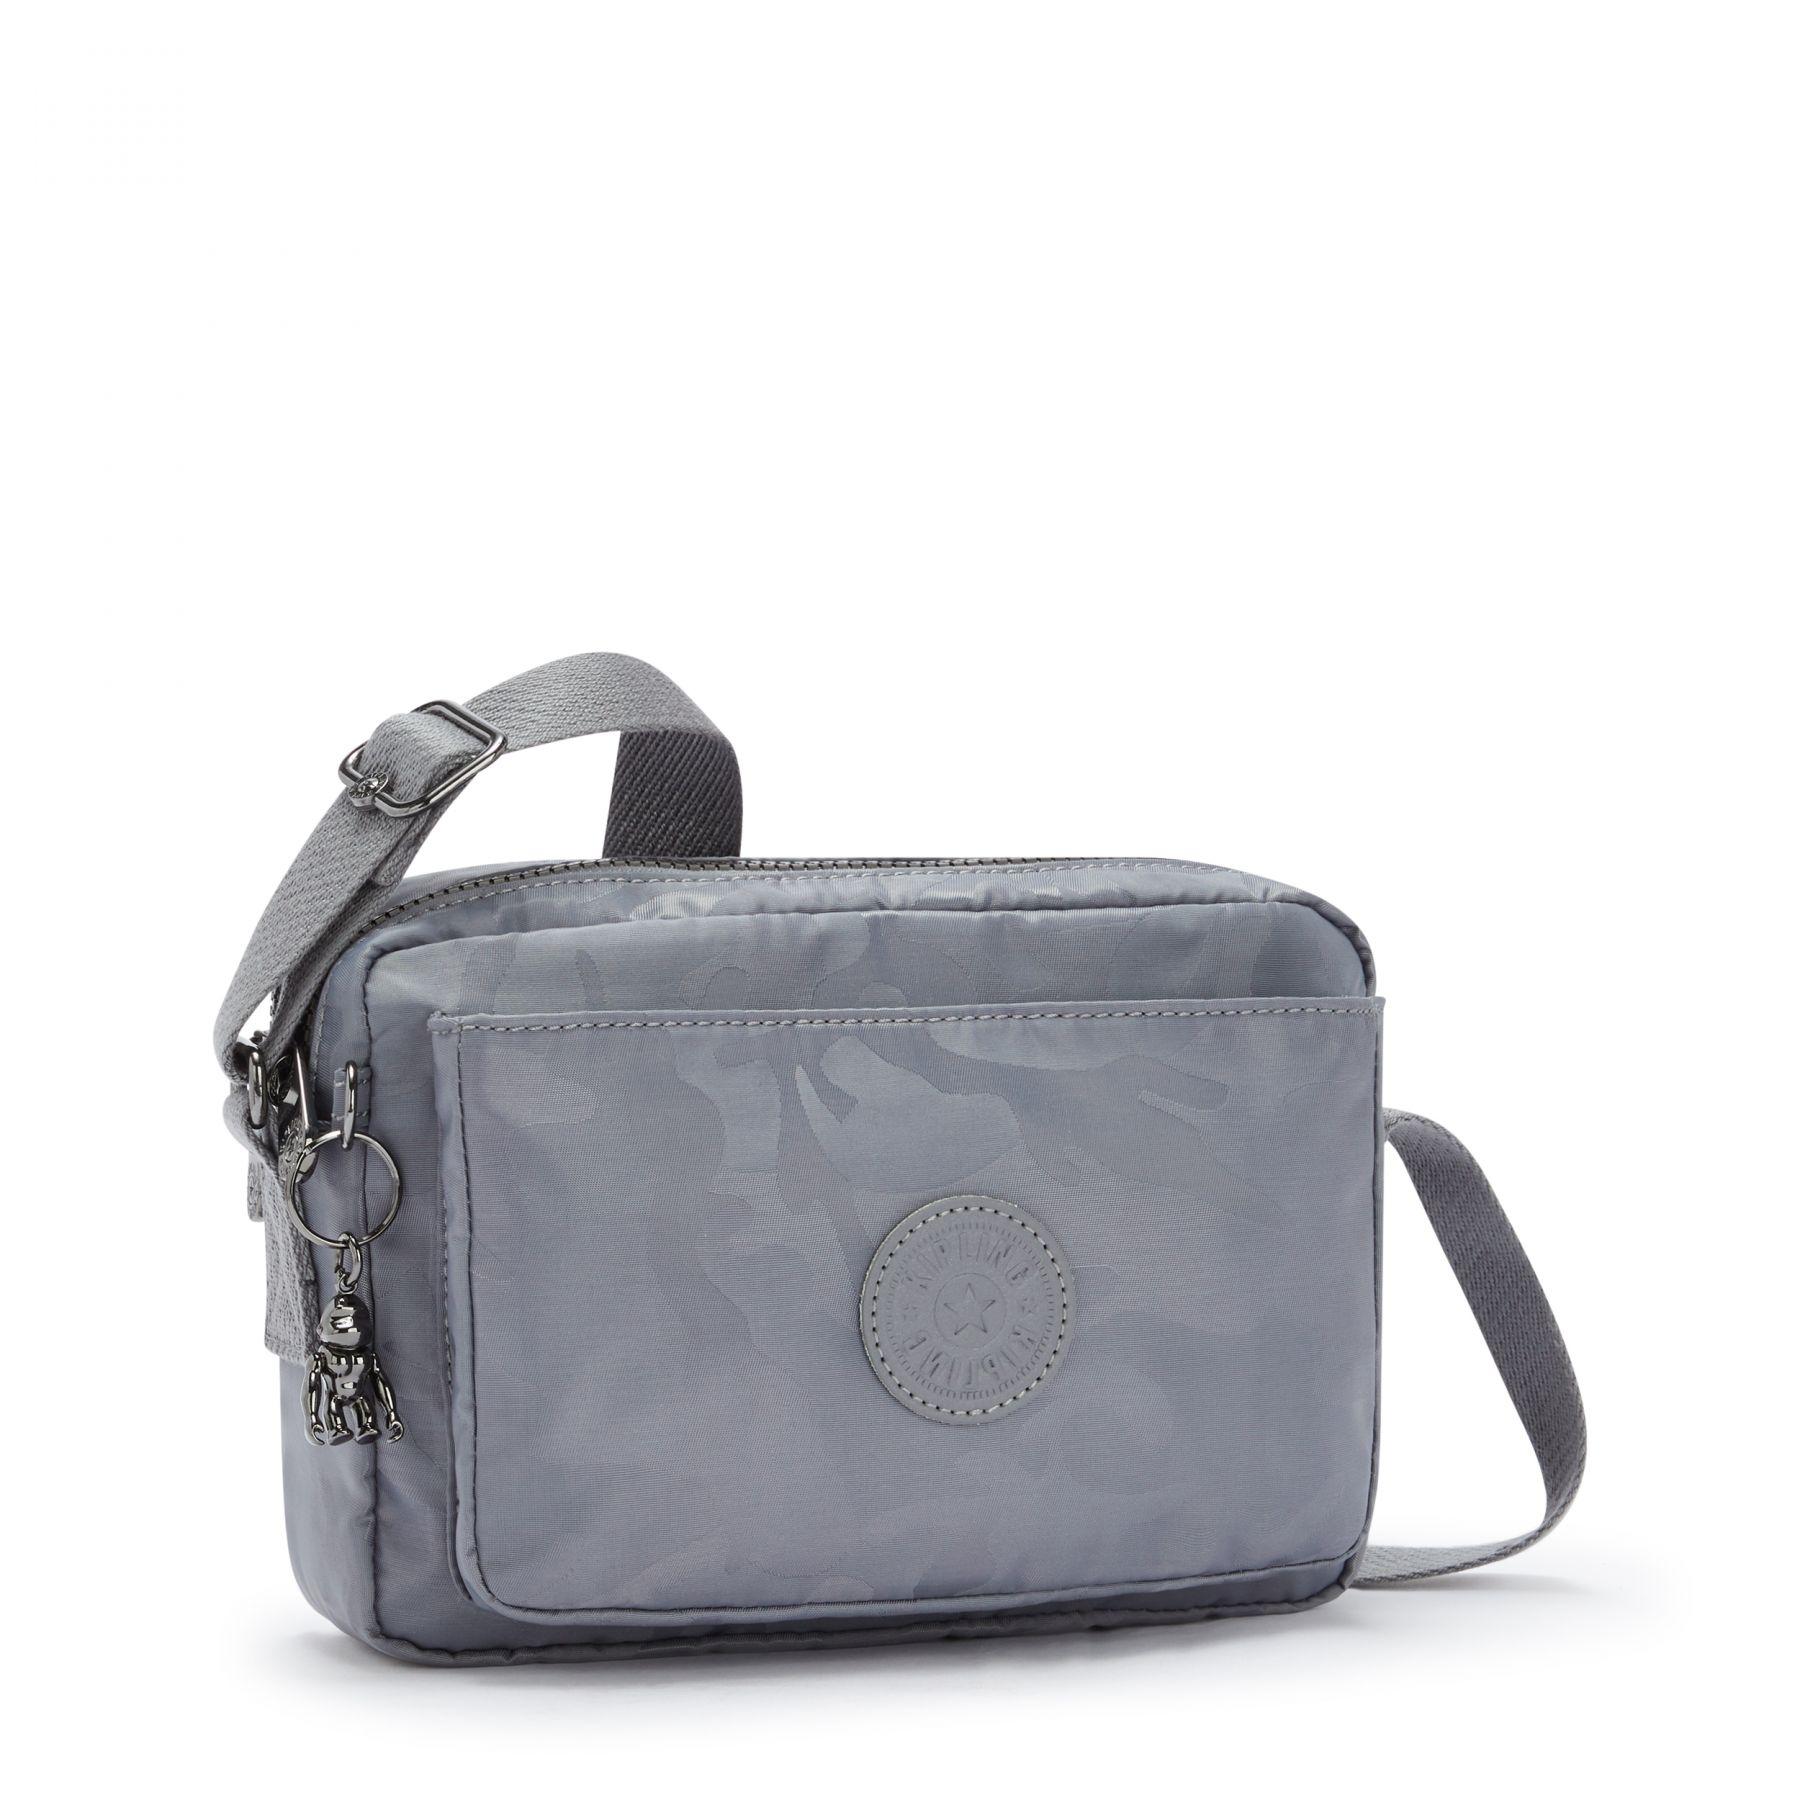 ABANU M BAGS by Kipling